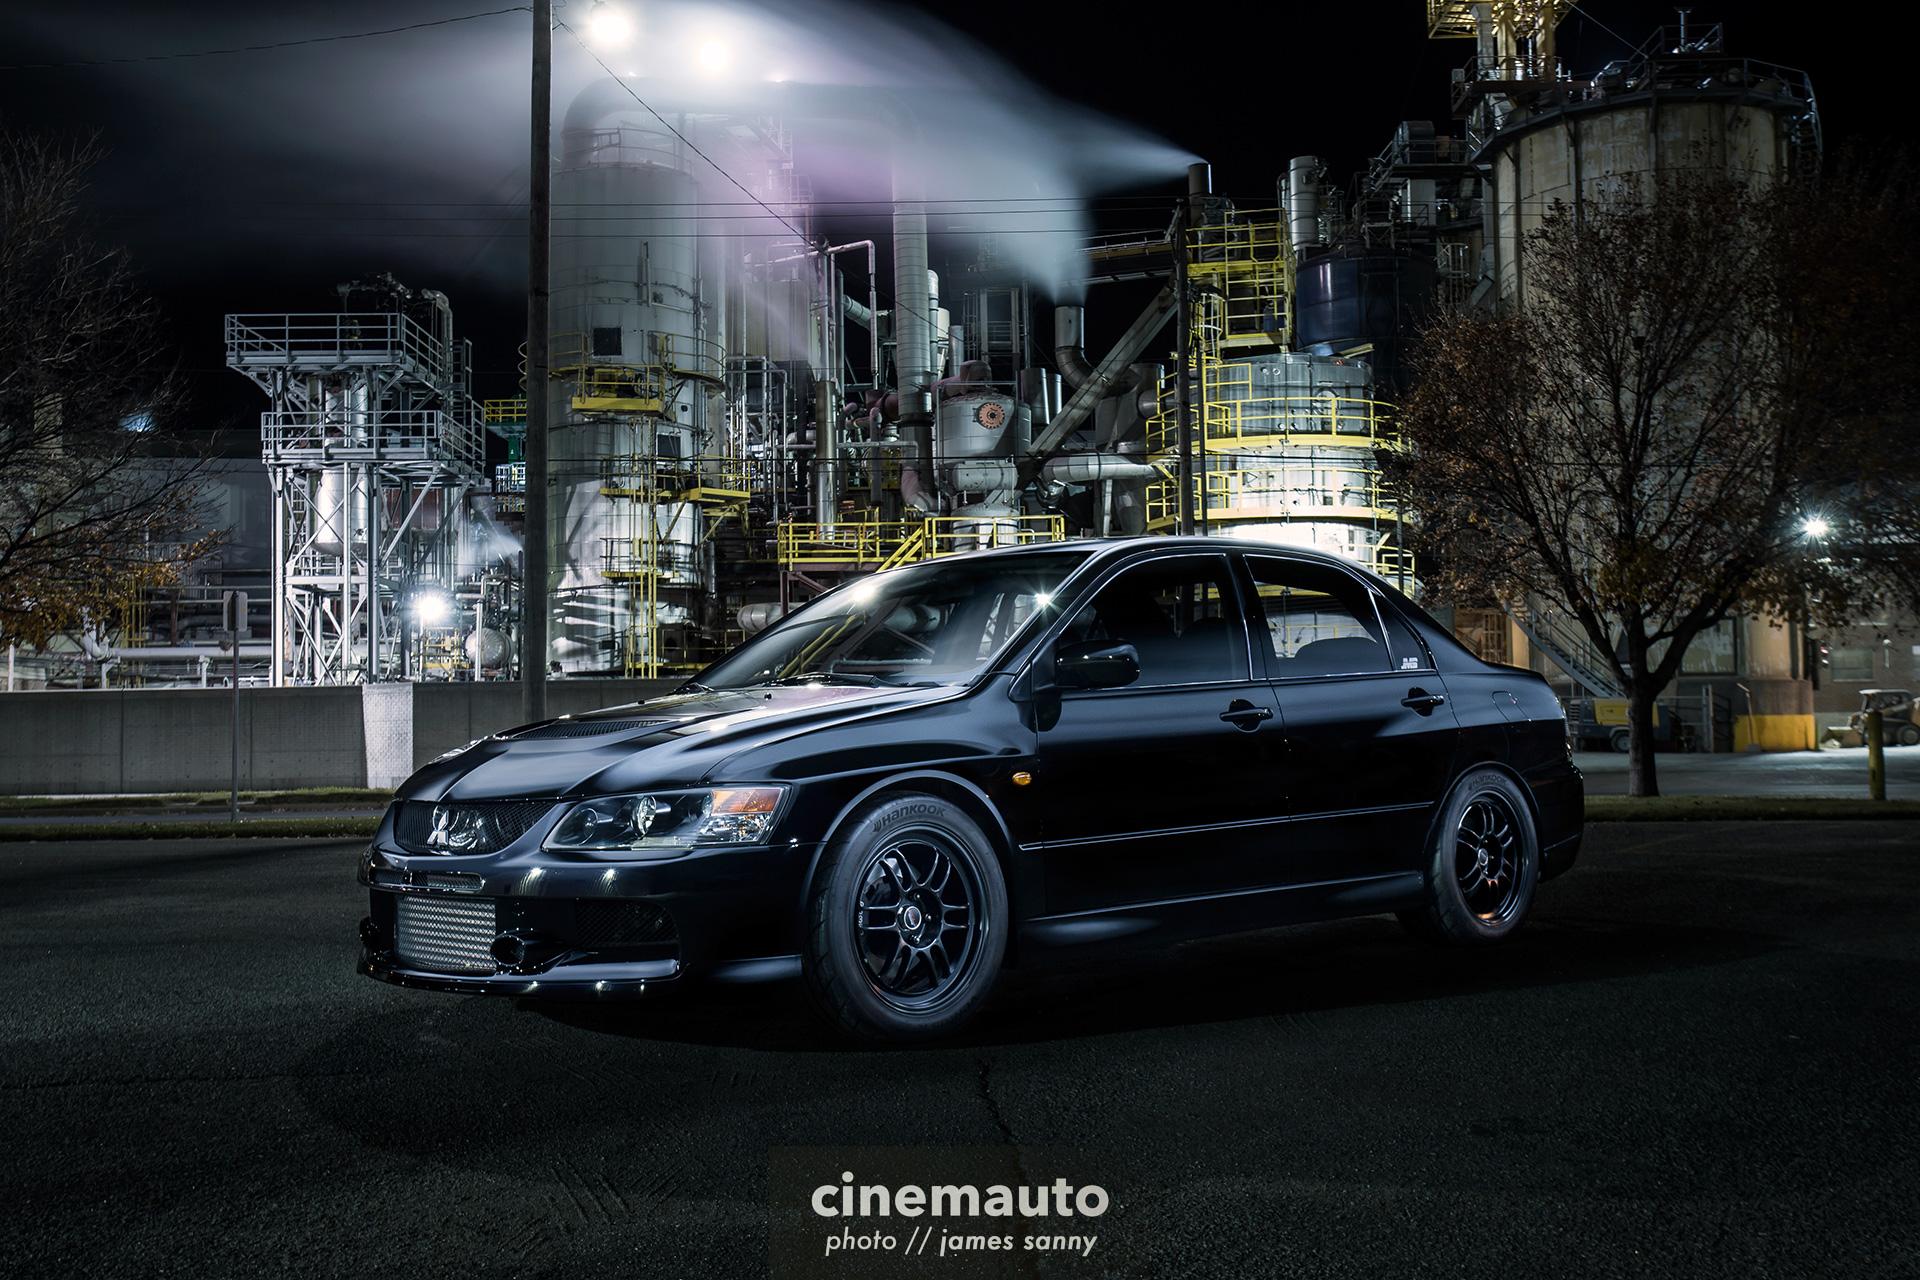 wichita-automotive-photographer-cinemauto-james-sanny-tj10sm.jpg